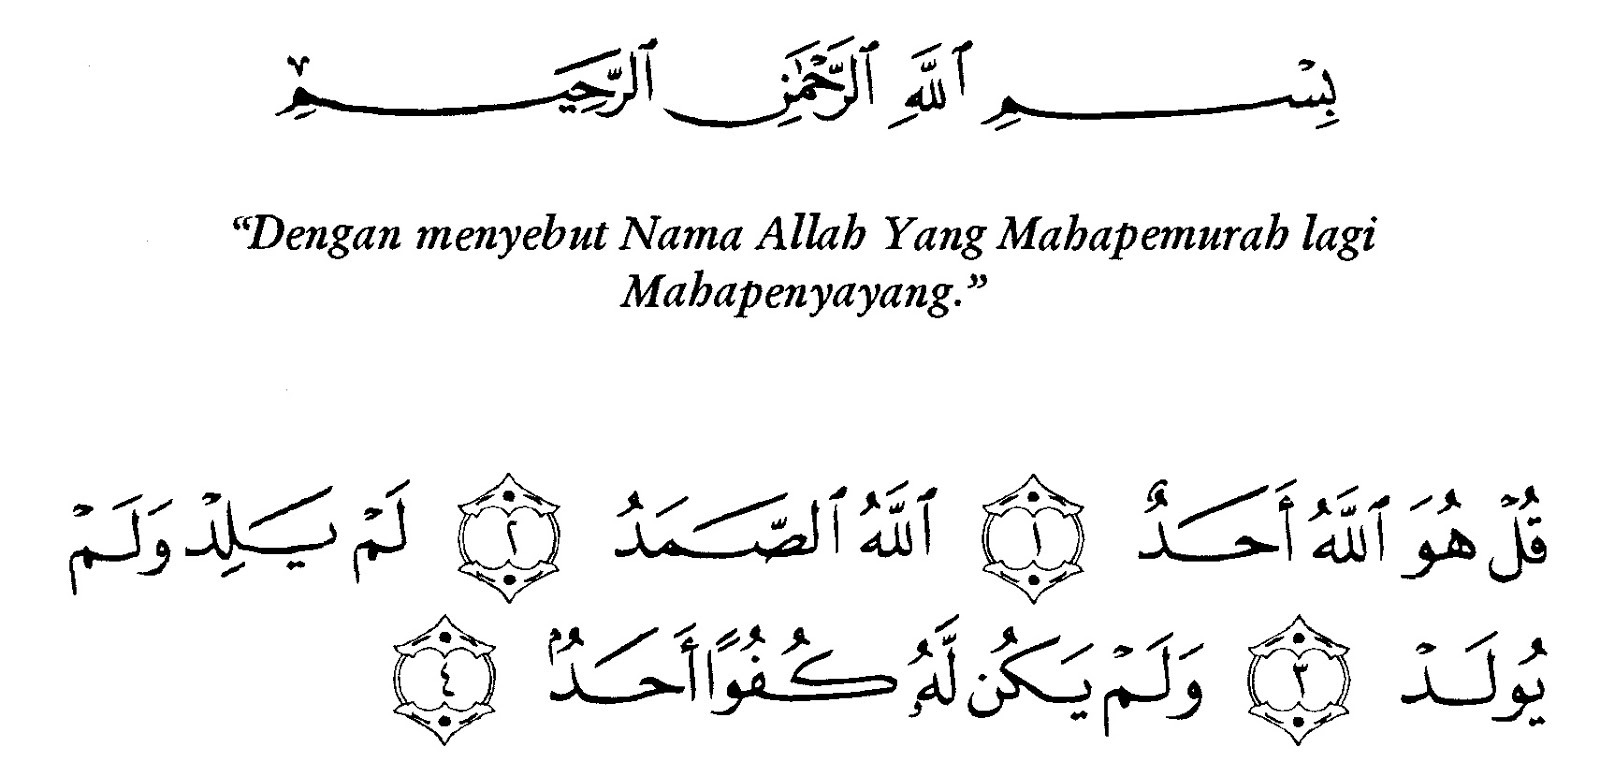 Mewarnai Gambar Gambar Tulisan Al Quran Surat Al Ikhlas